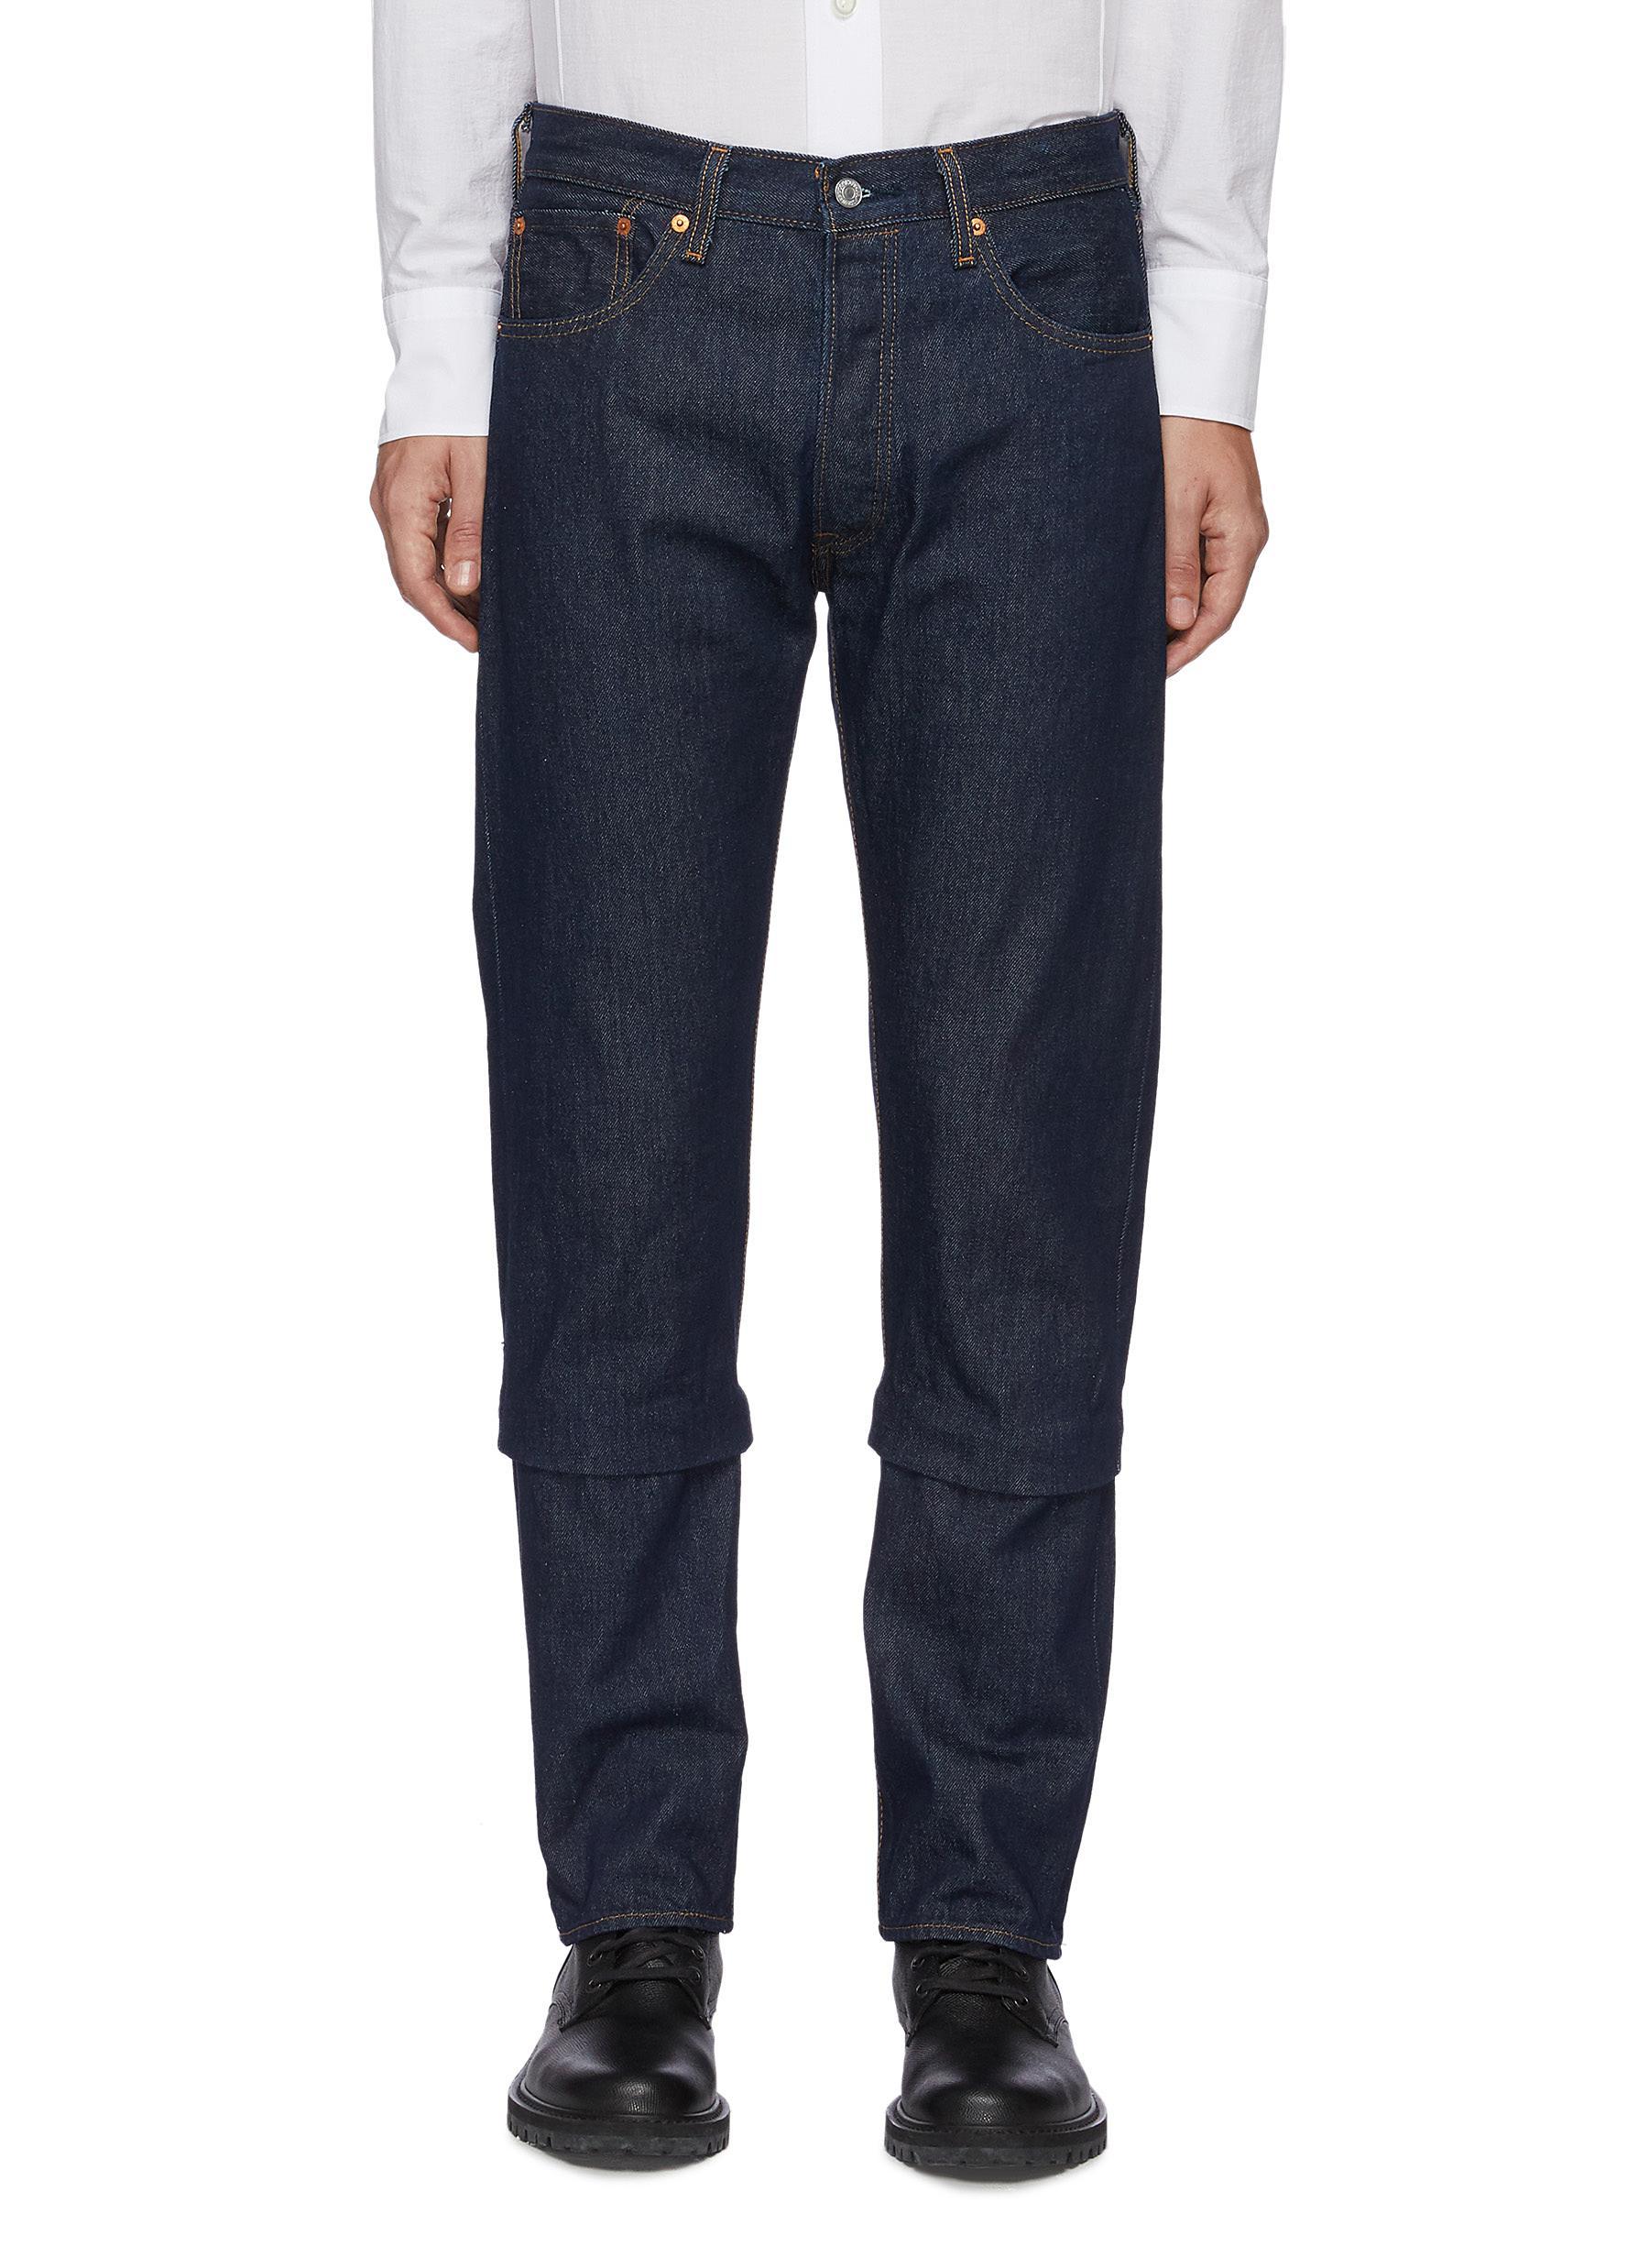 Dark rinse two way cuff jeans